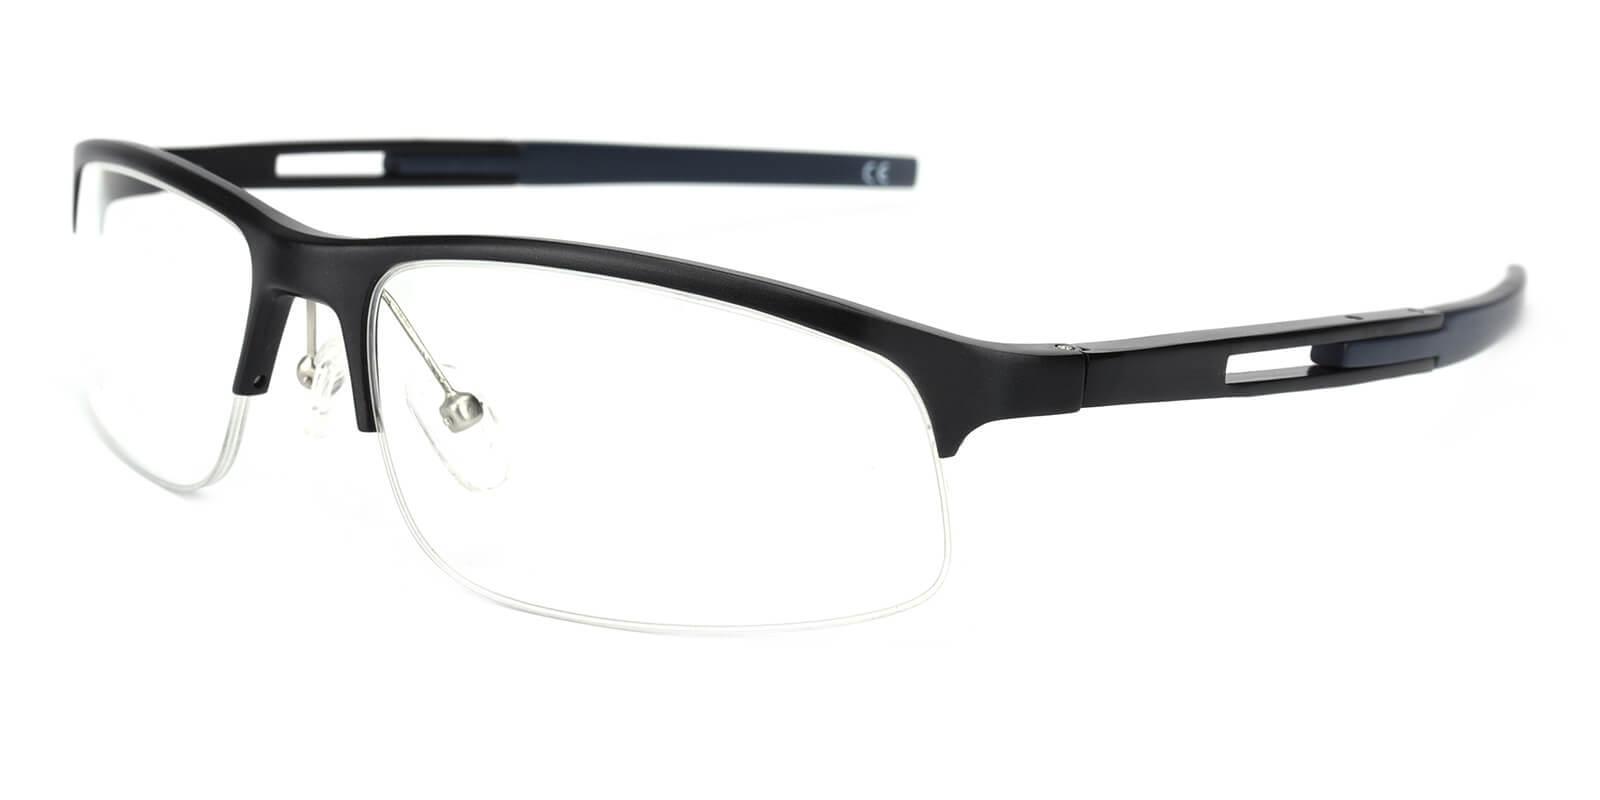 Graysun-Black-Rectangle-Metal-SportsGlasses-additional1